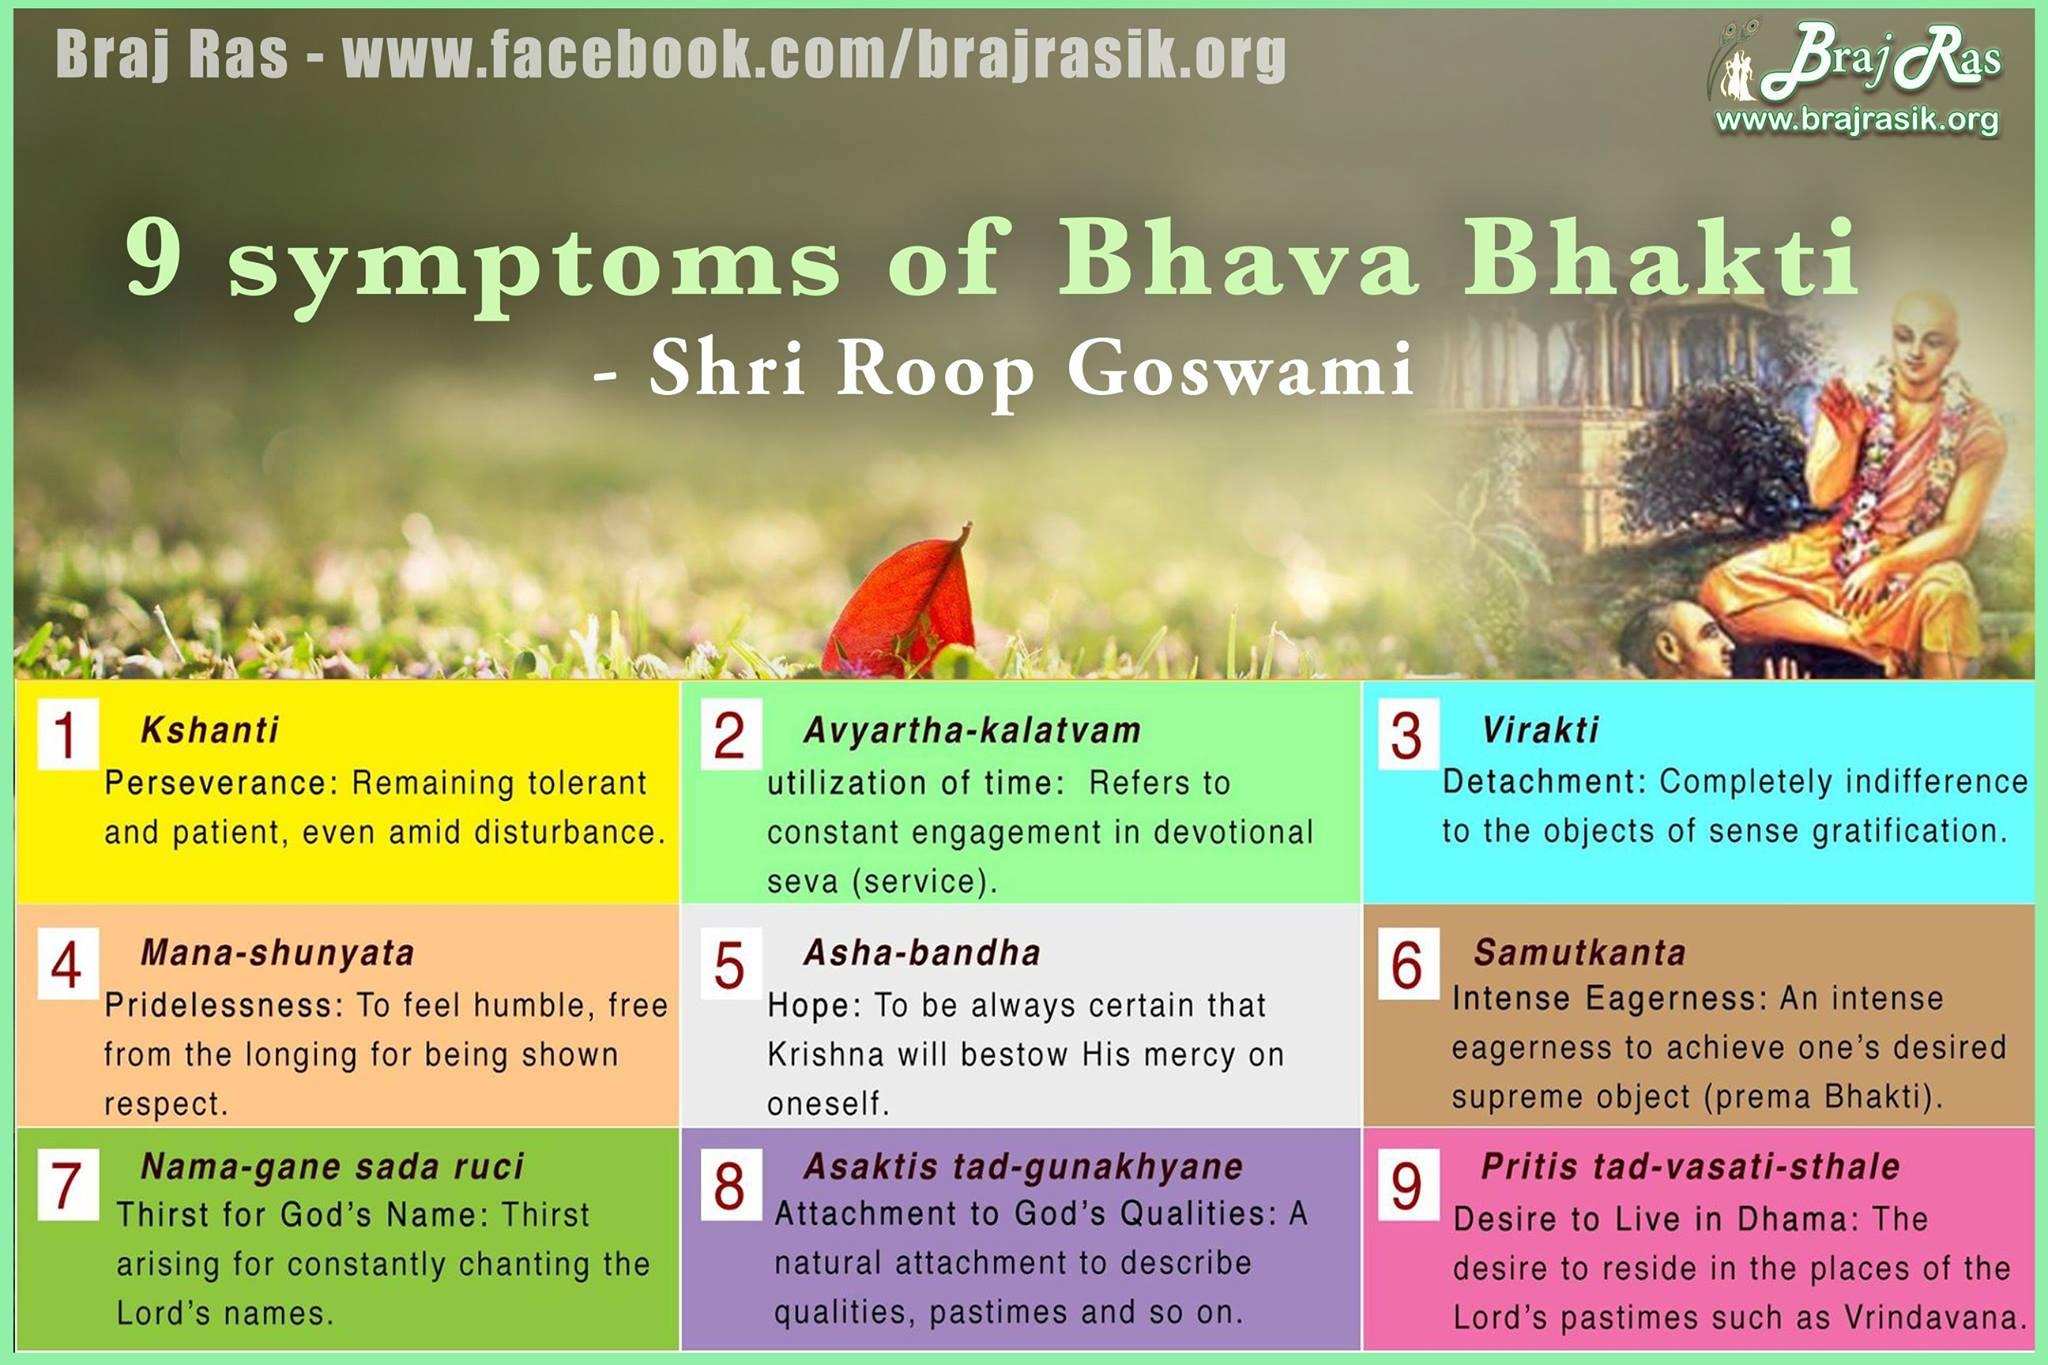 Nine symptoms of Bhava Bhakti- Roop Goswami, Bhakti Rasamrit Sindhu.